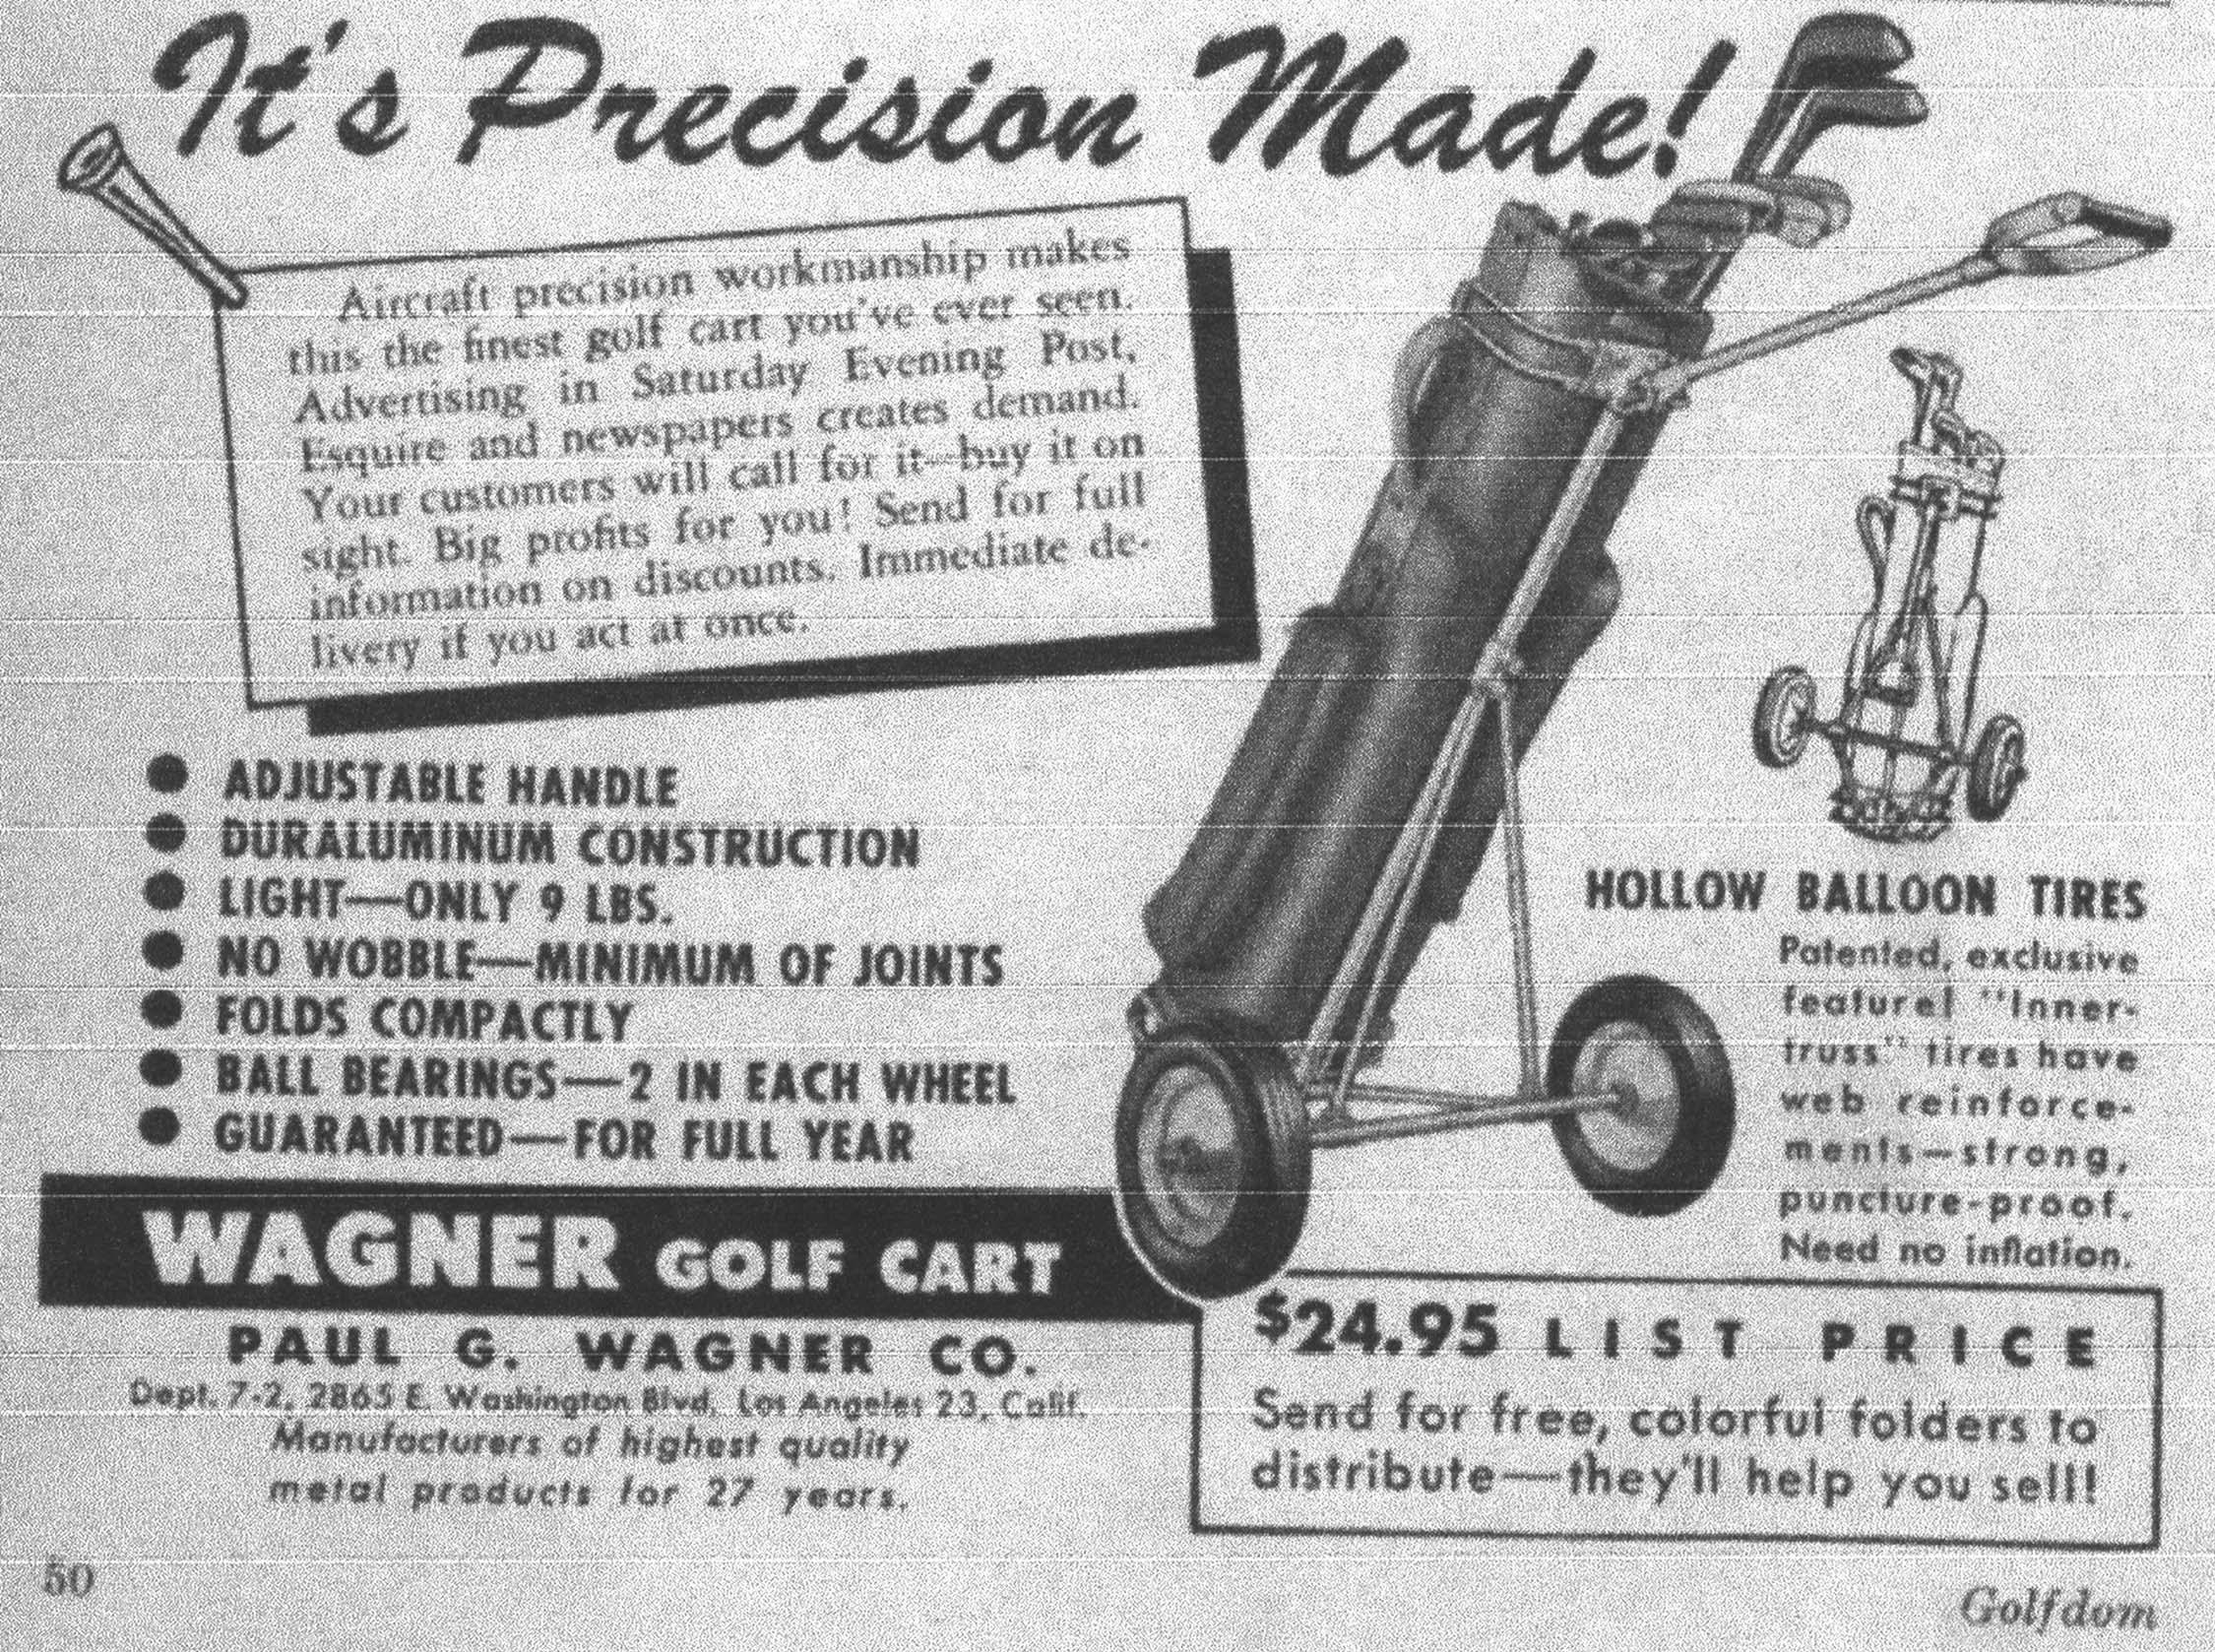 History of Golf Pull Cart |